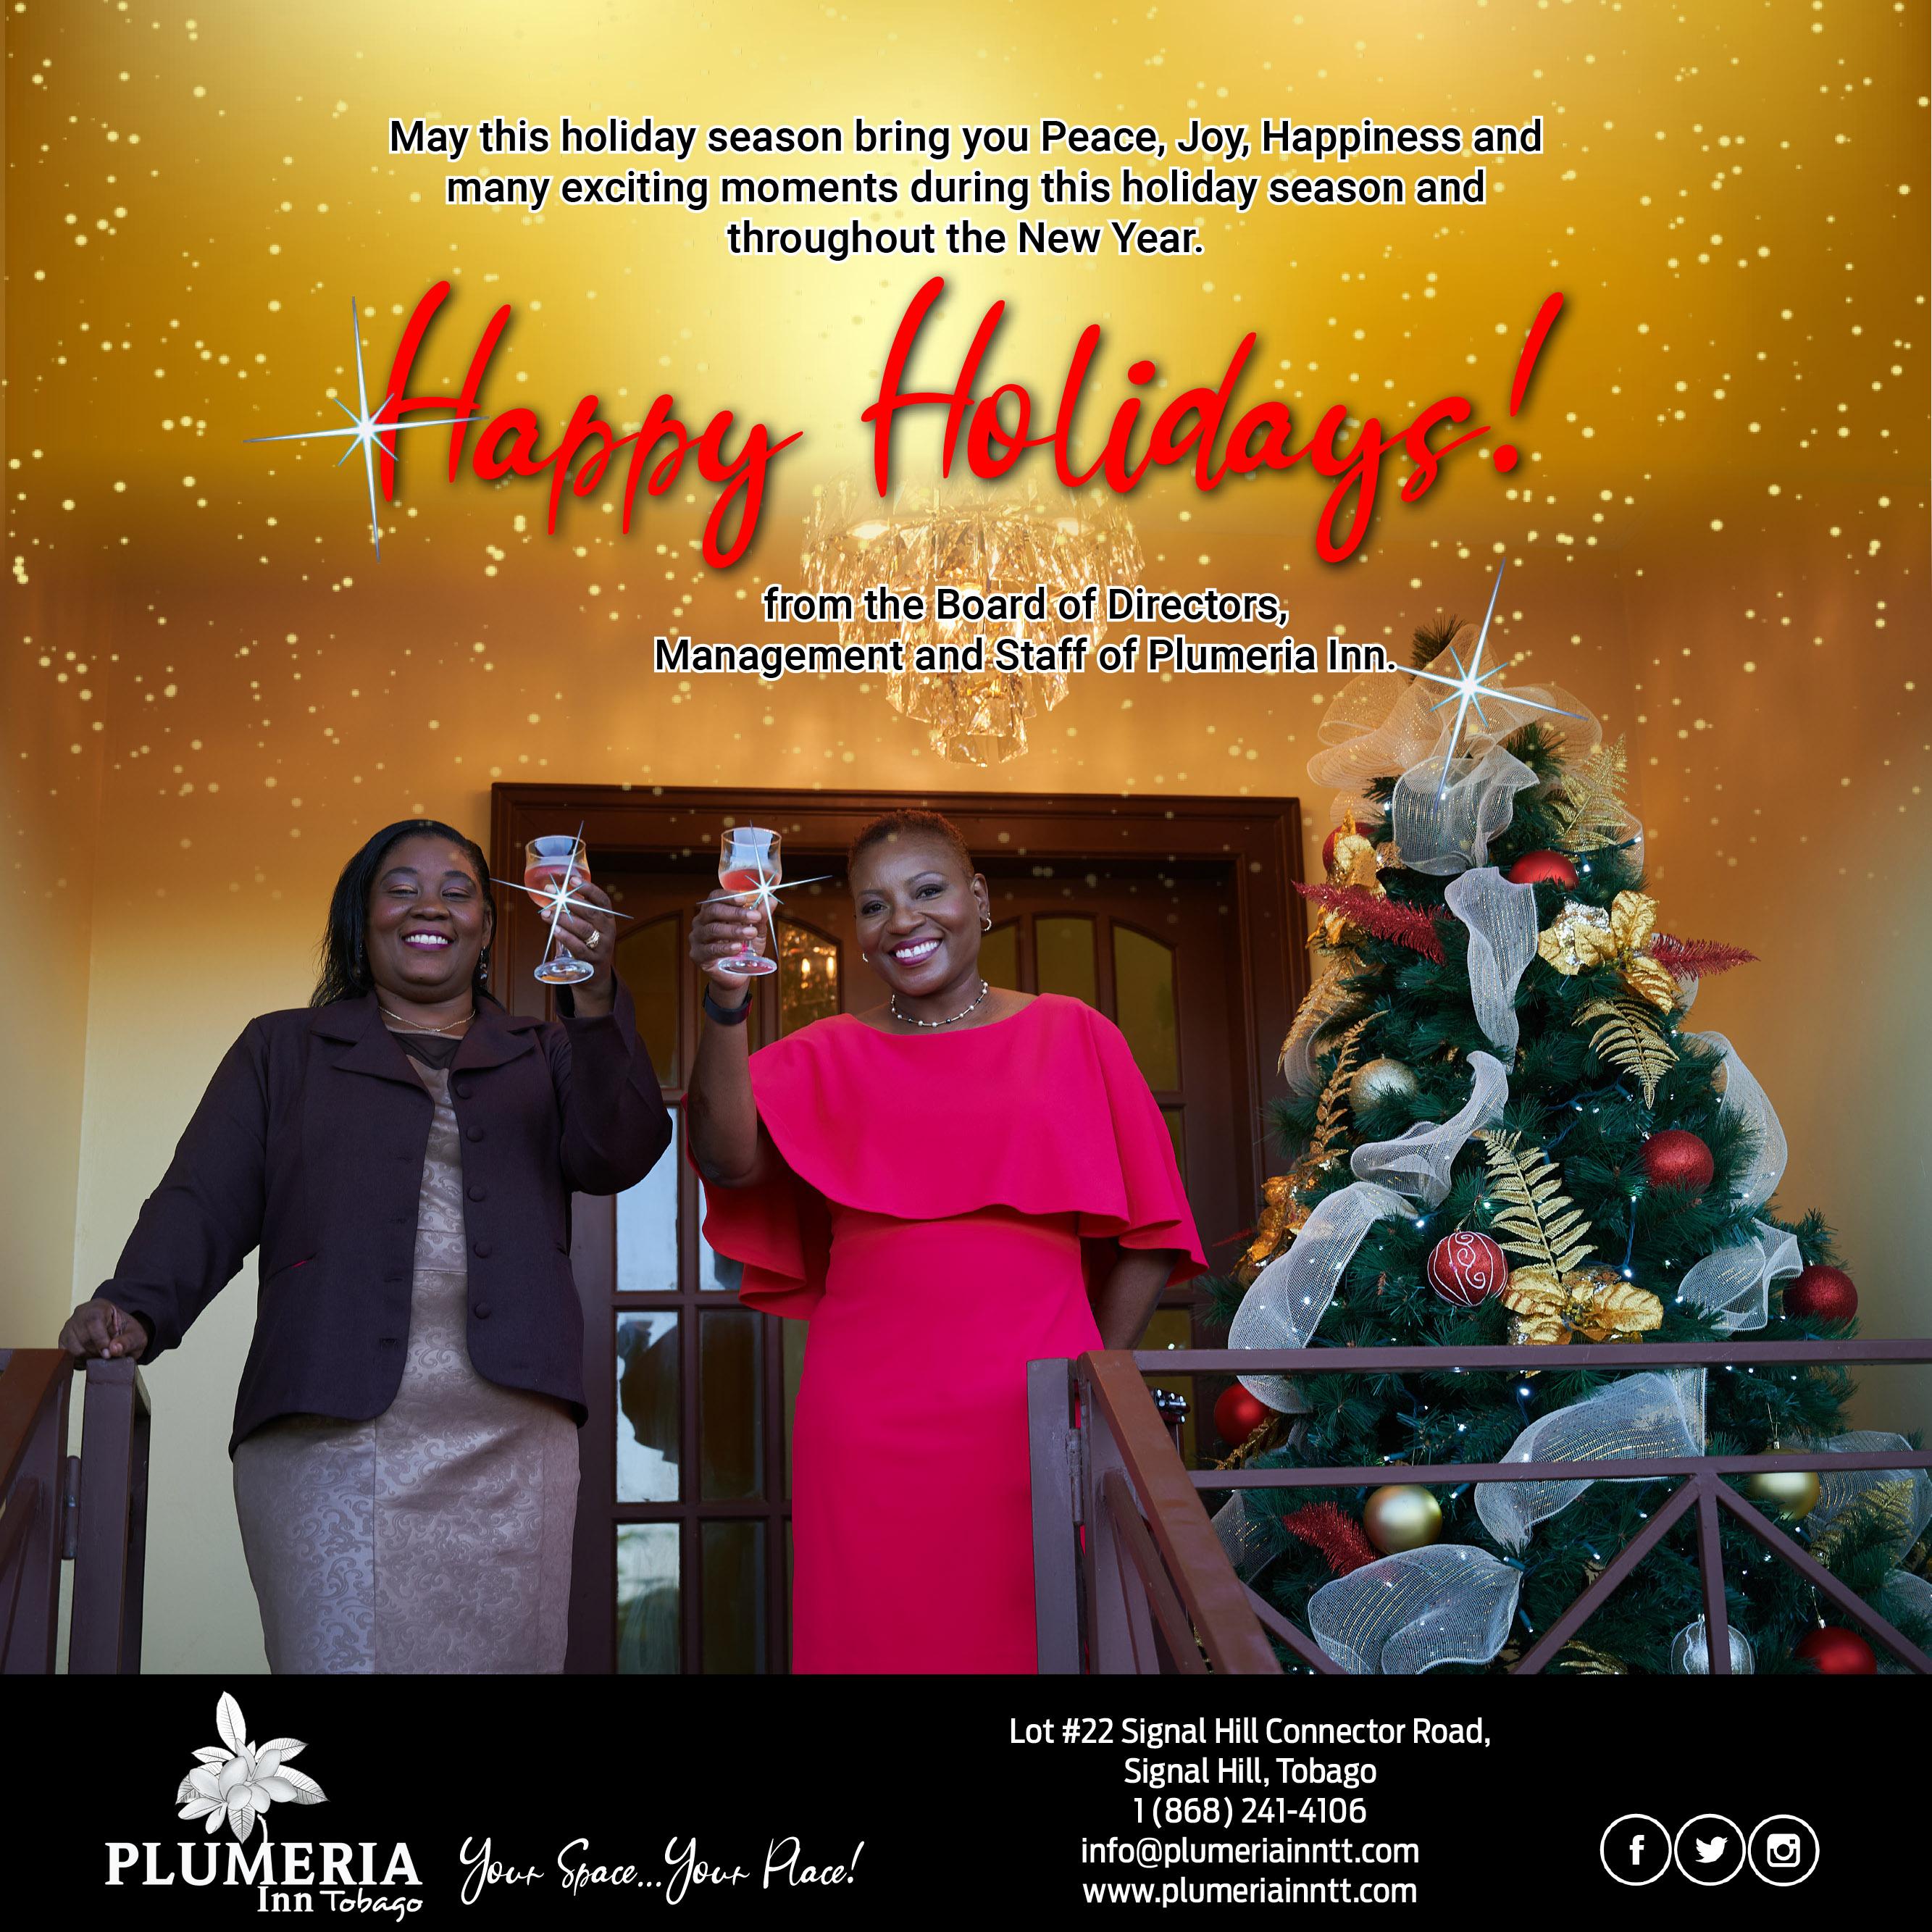 Plumeria Holiday Season Greetings 2020